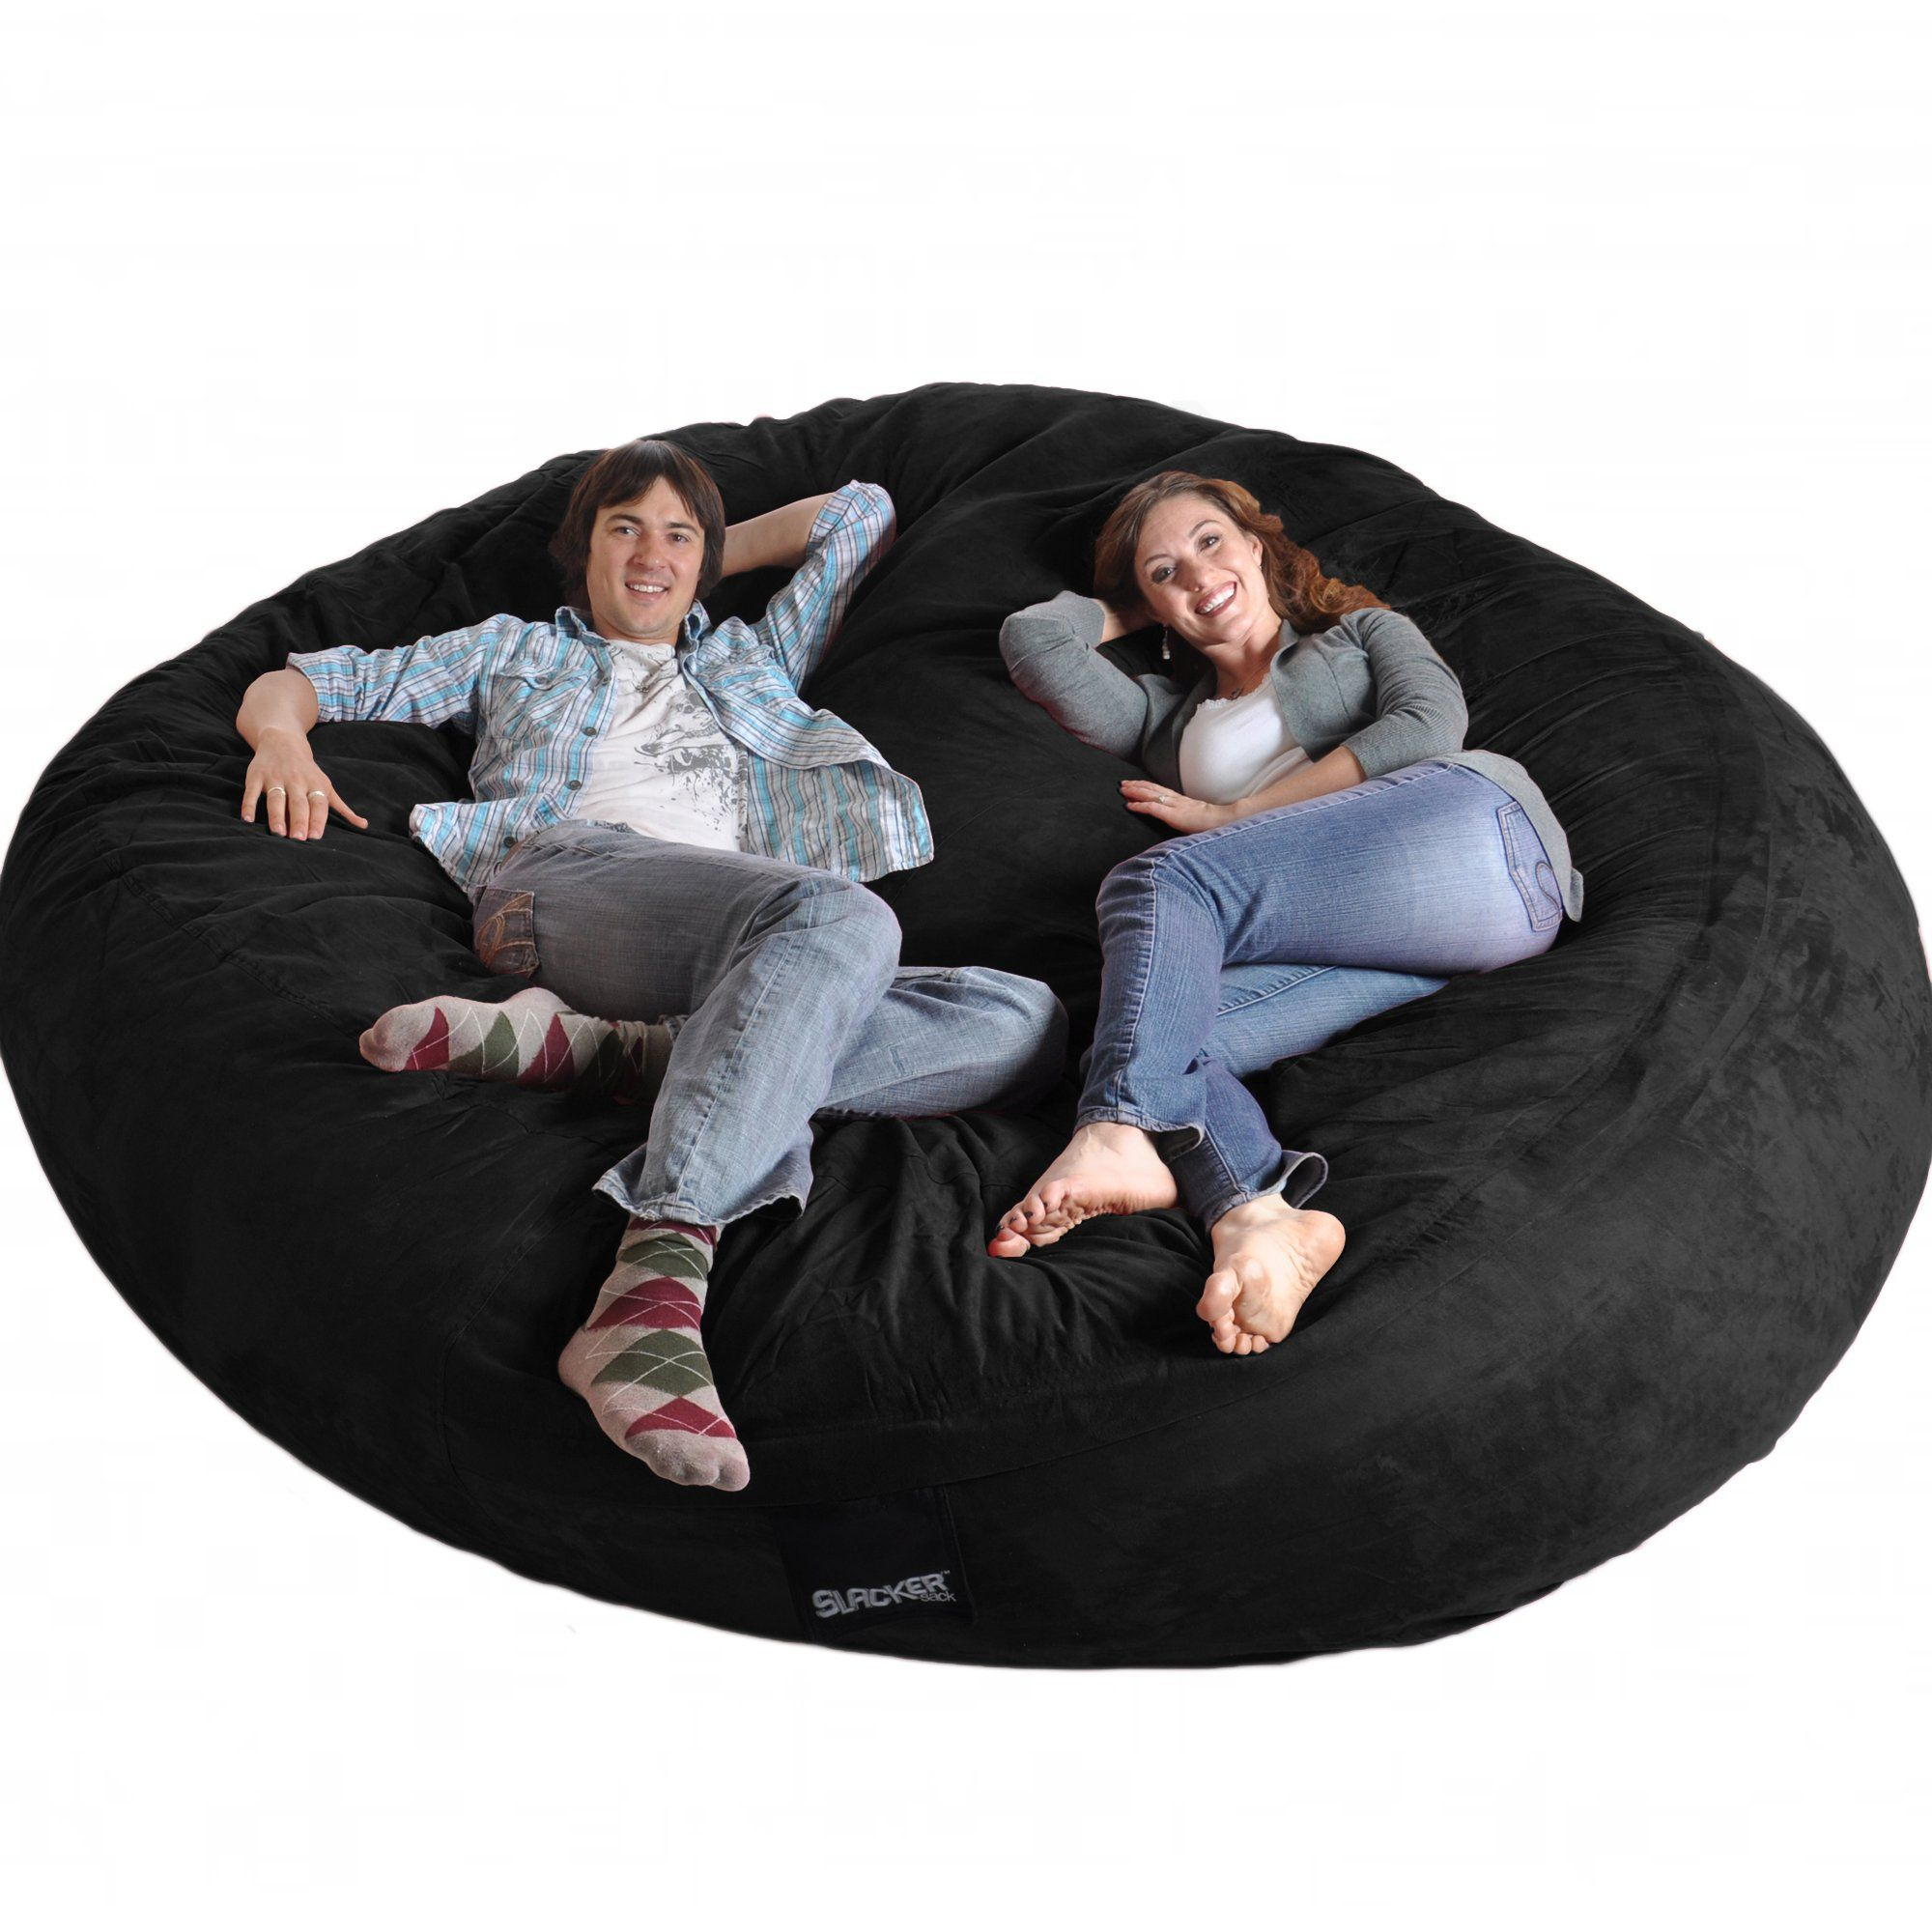 8' Round Black SLACKER Sack Biggest Foam Bean Bag